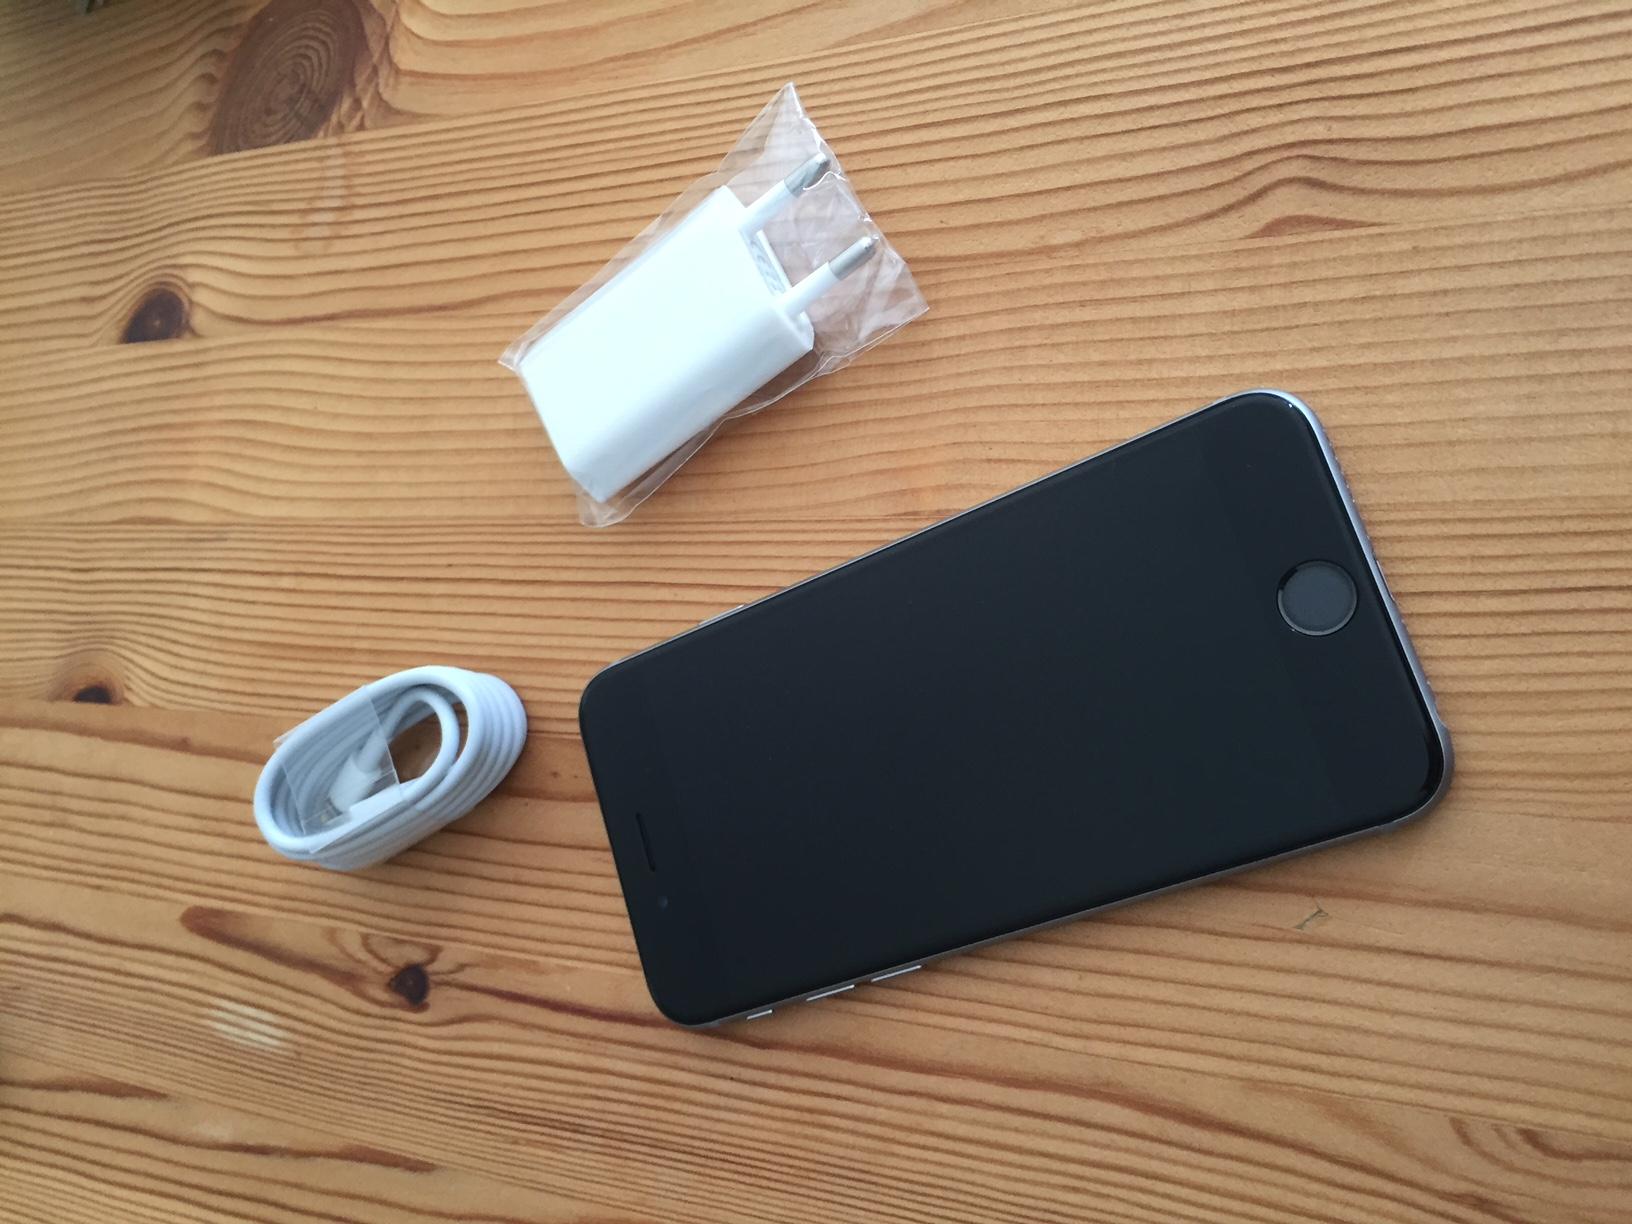 Rebuy Iphone 6